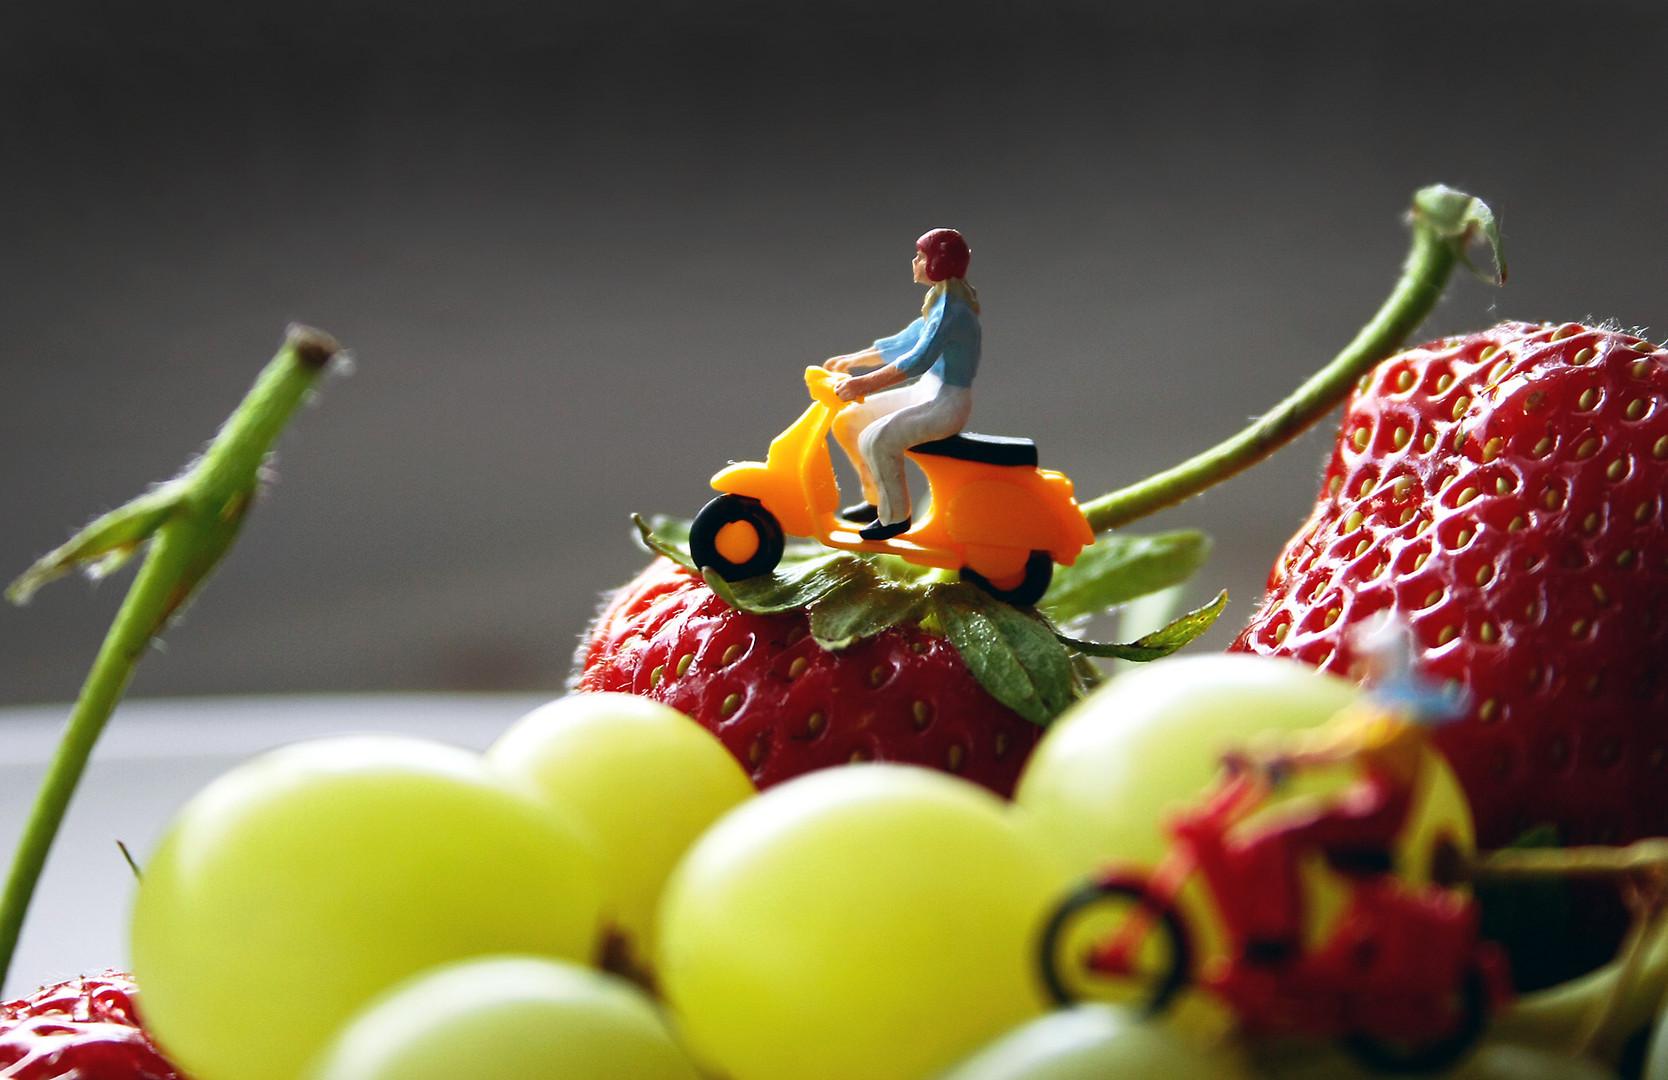 Ausflug auf dem Erdbeerberg ;)